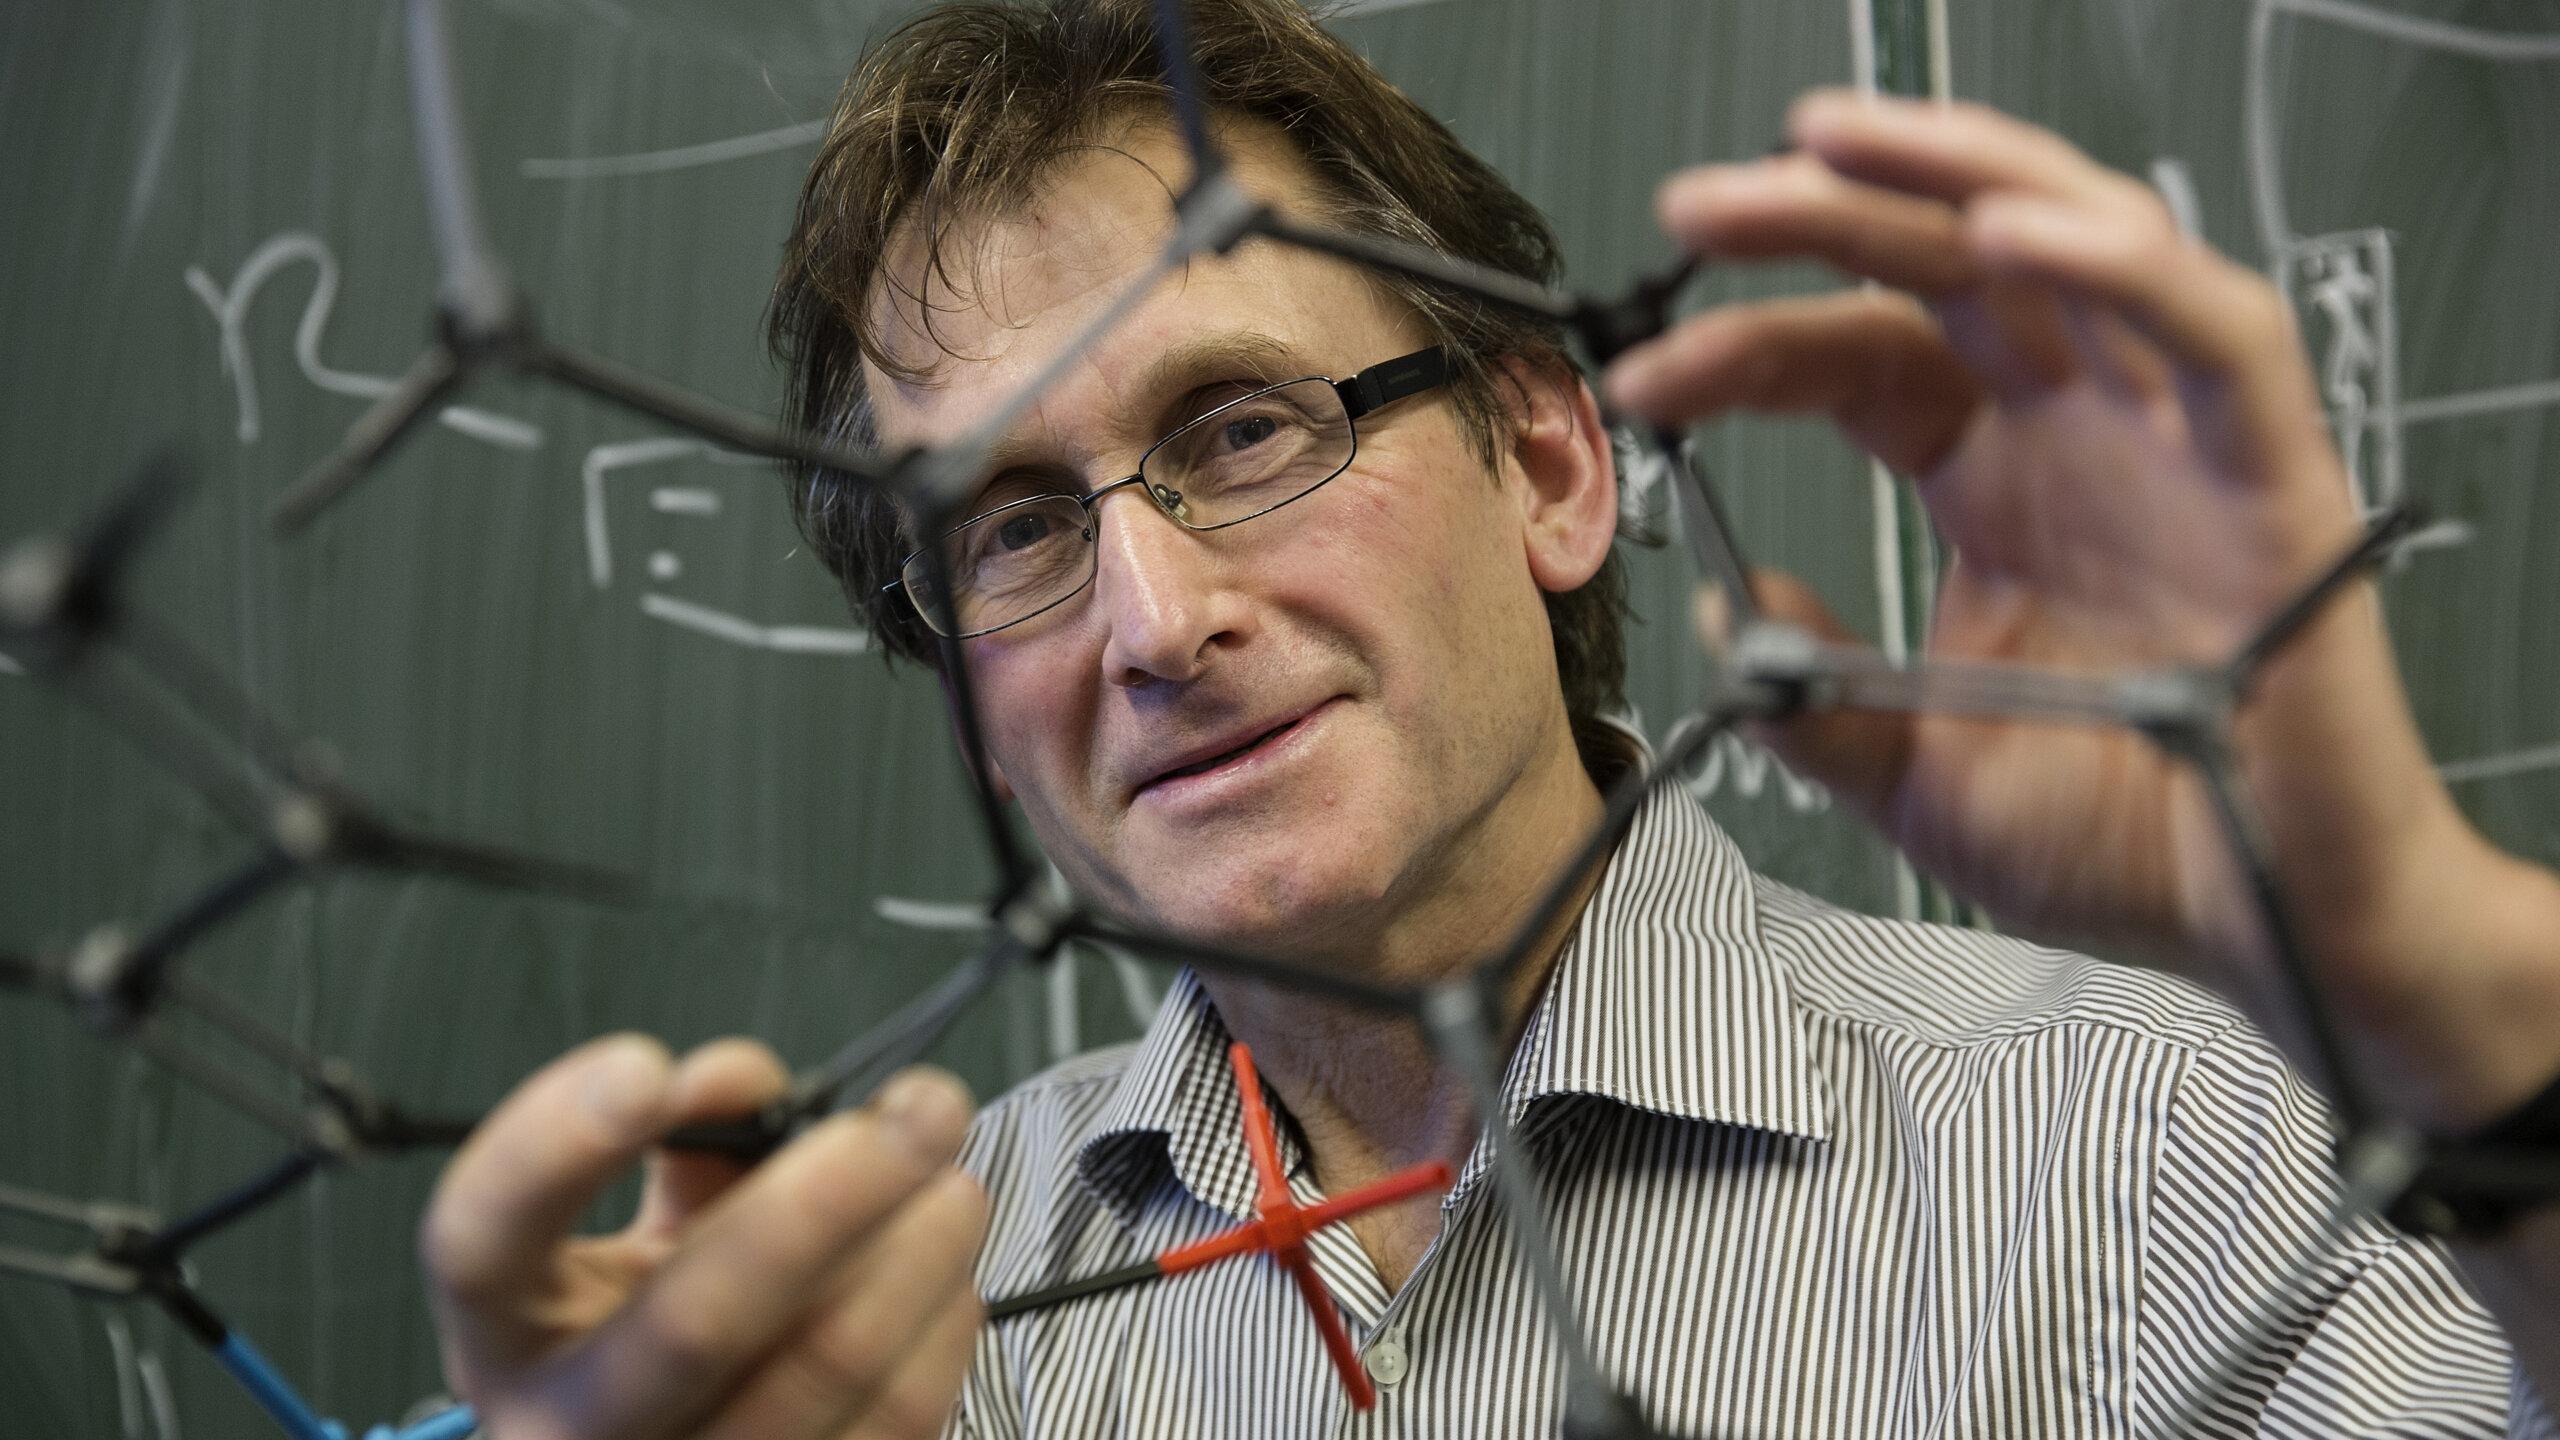 Bernard Feringa at Groningen University